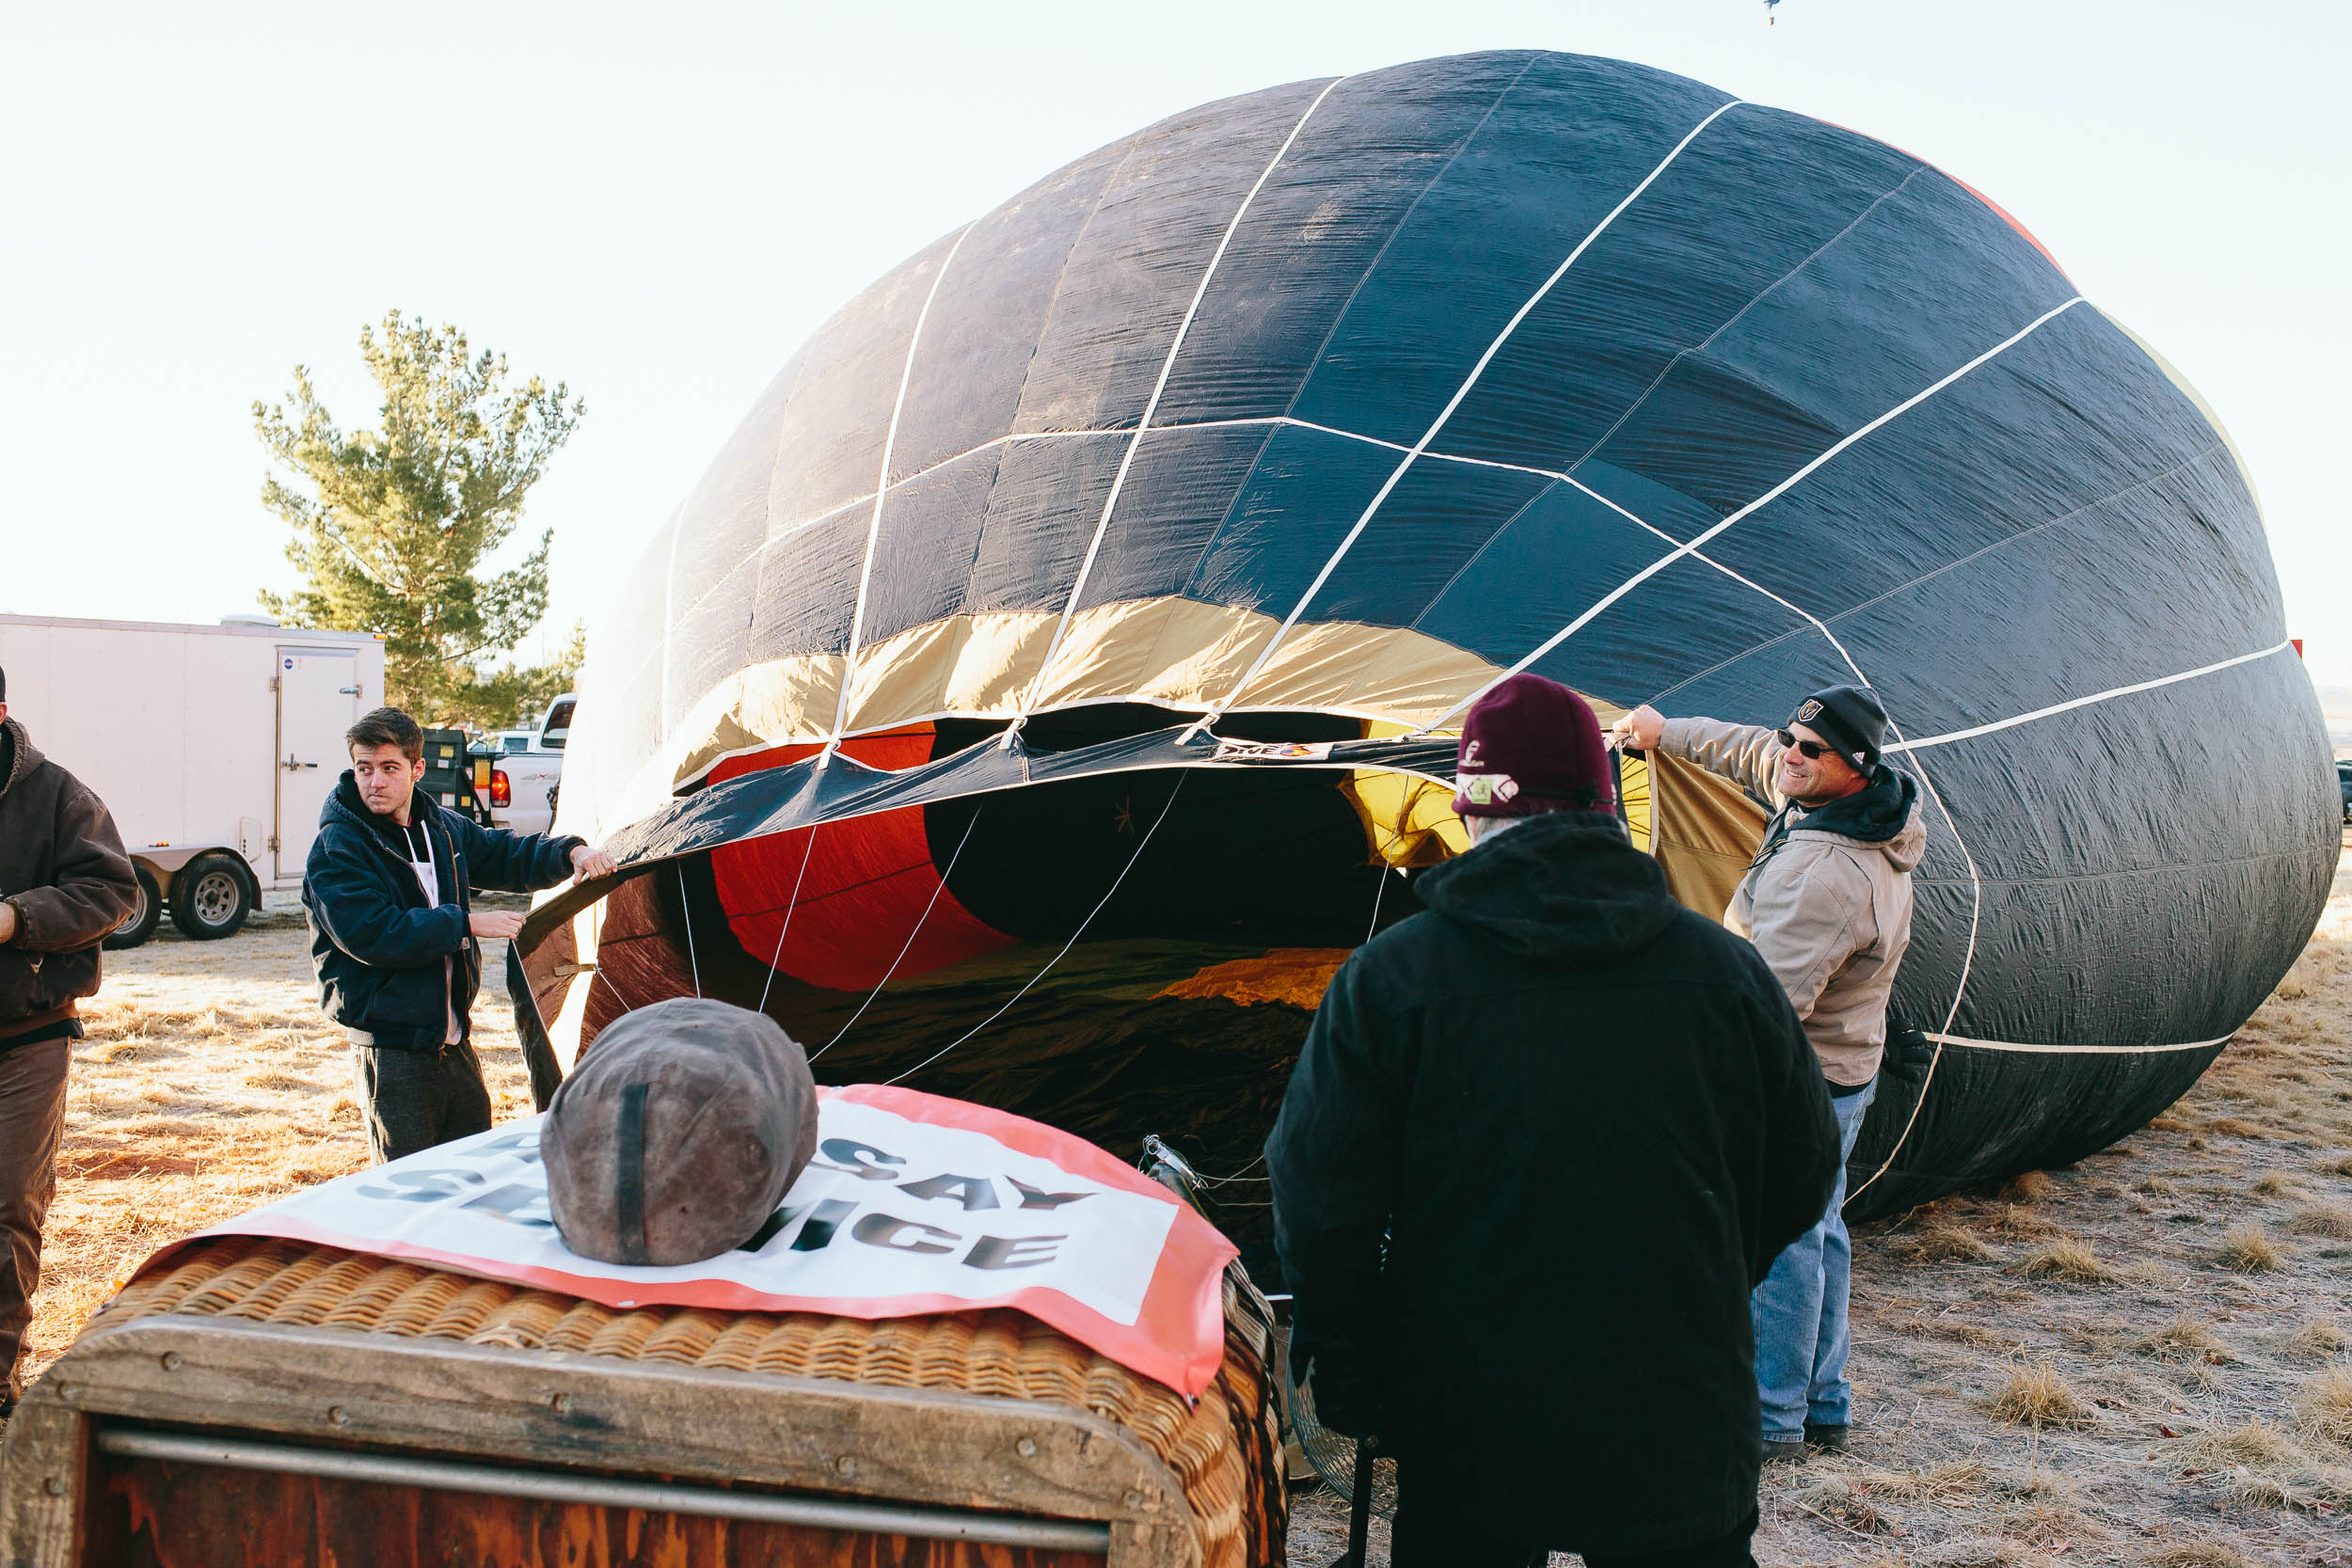 Kyle-Sheppard-Kanab-Balloon-Festival-10.jpg